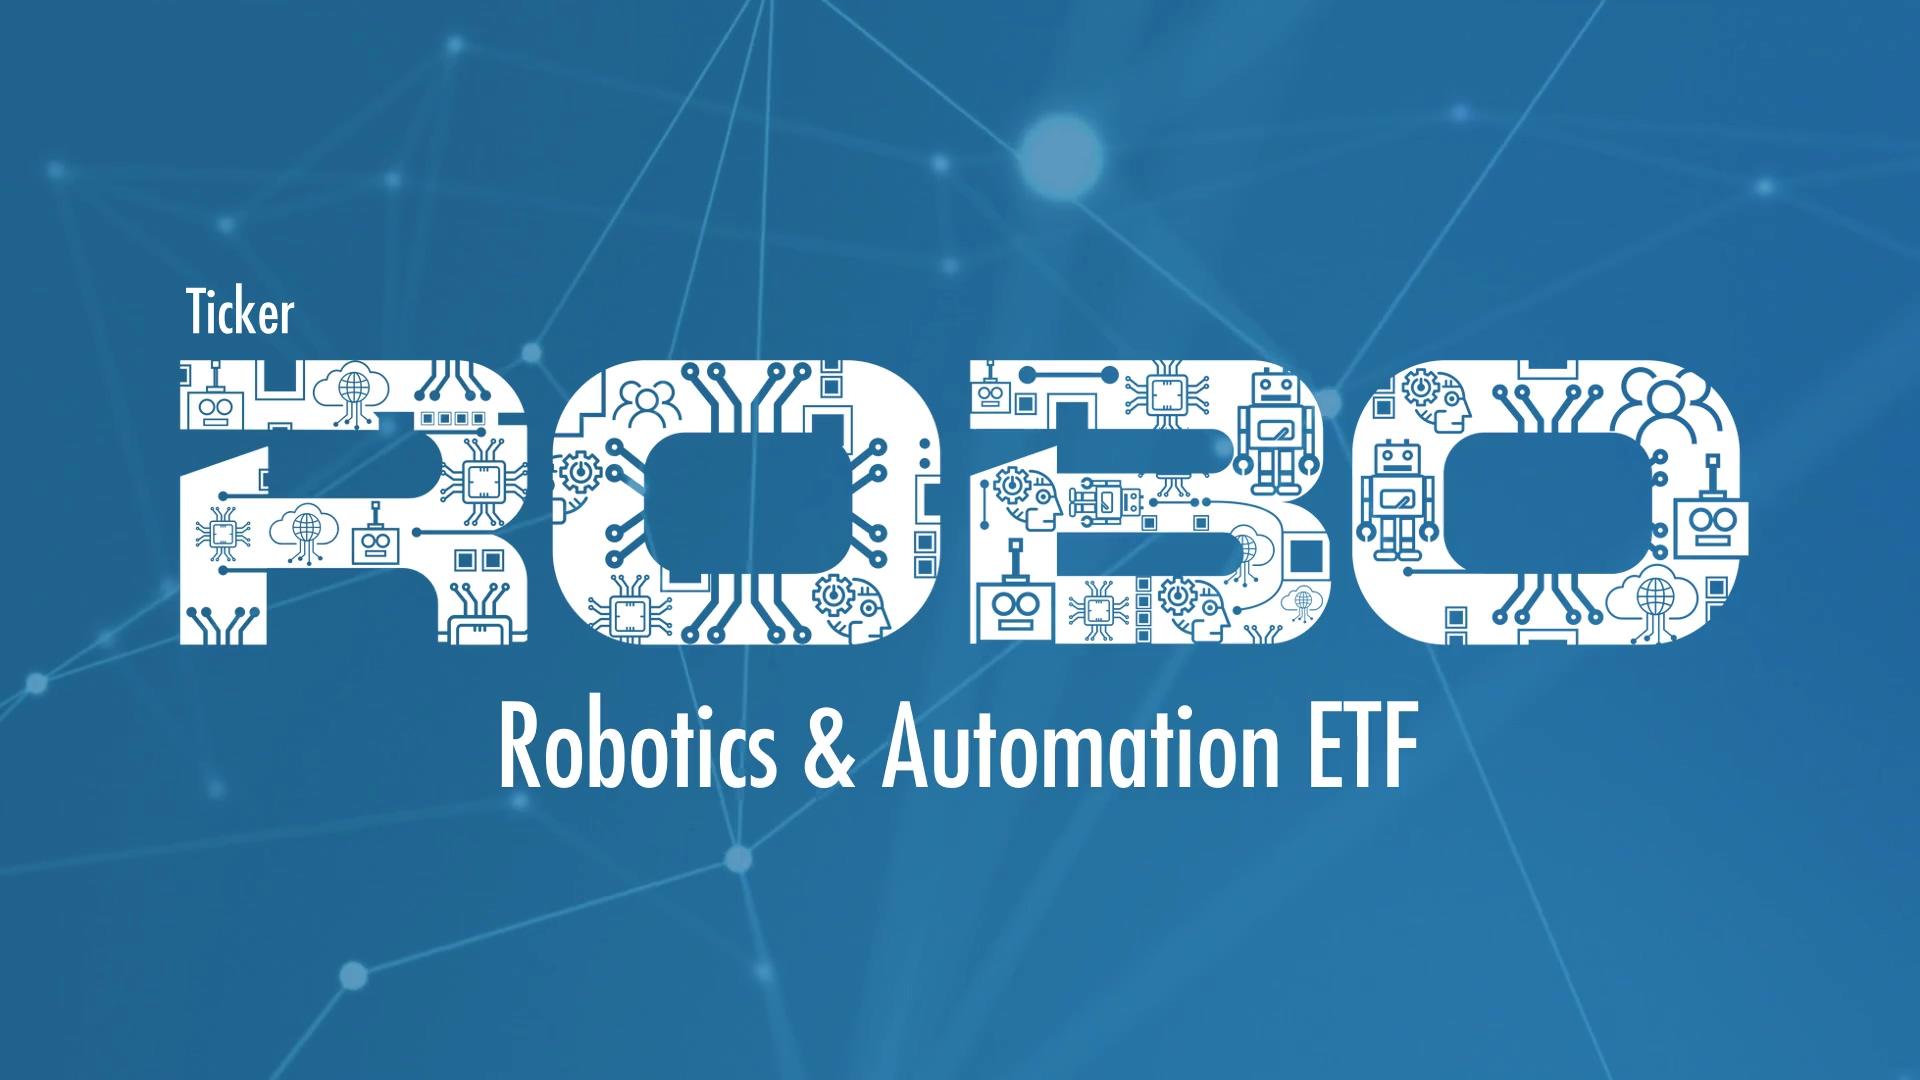 [VIDEO] ROBO ETF Overview